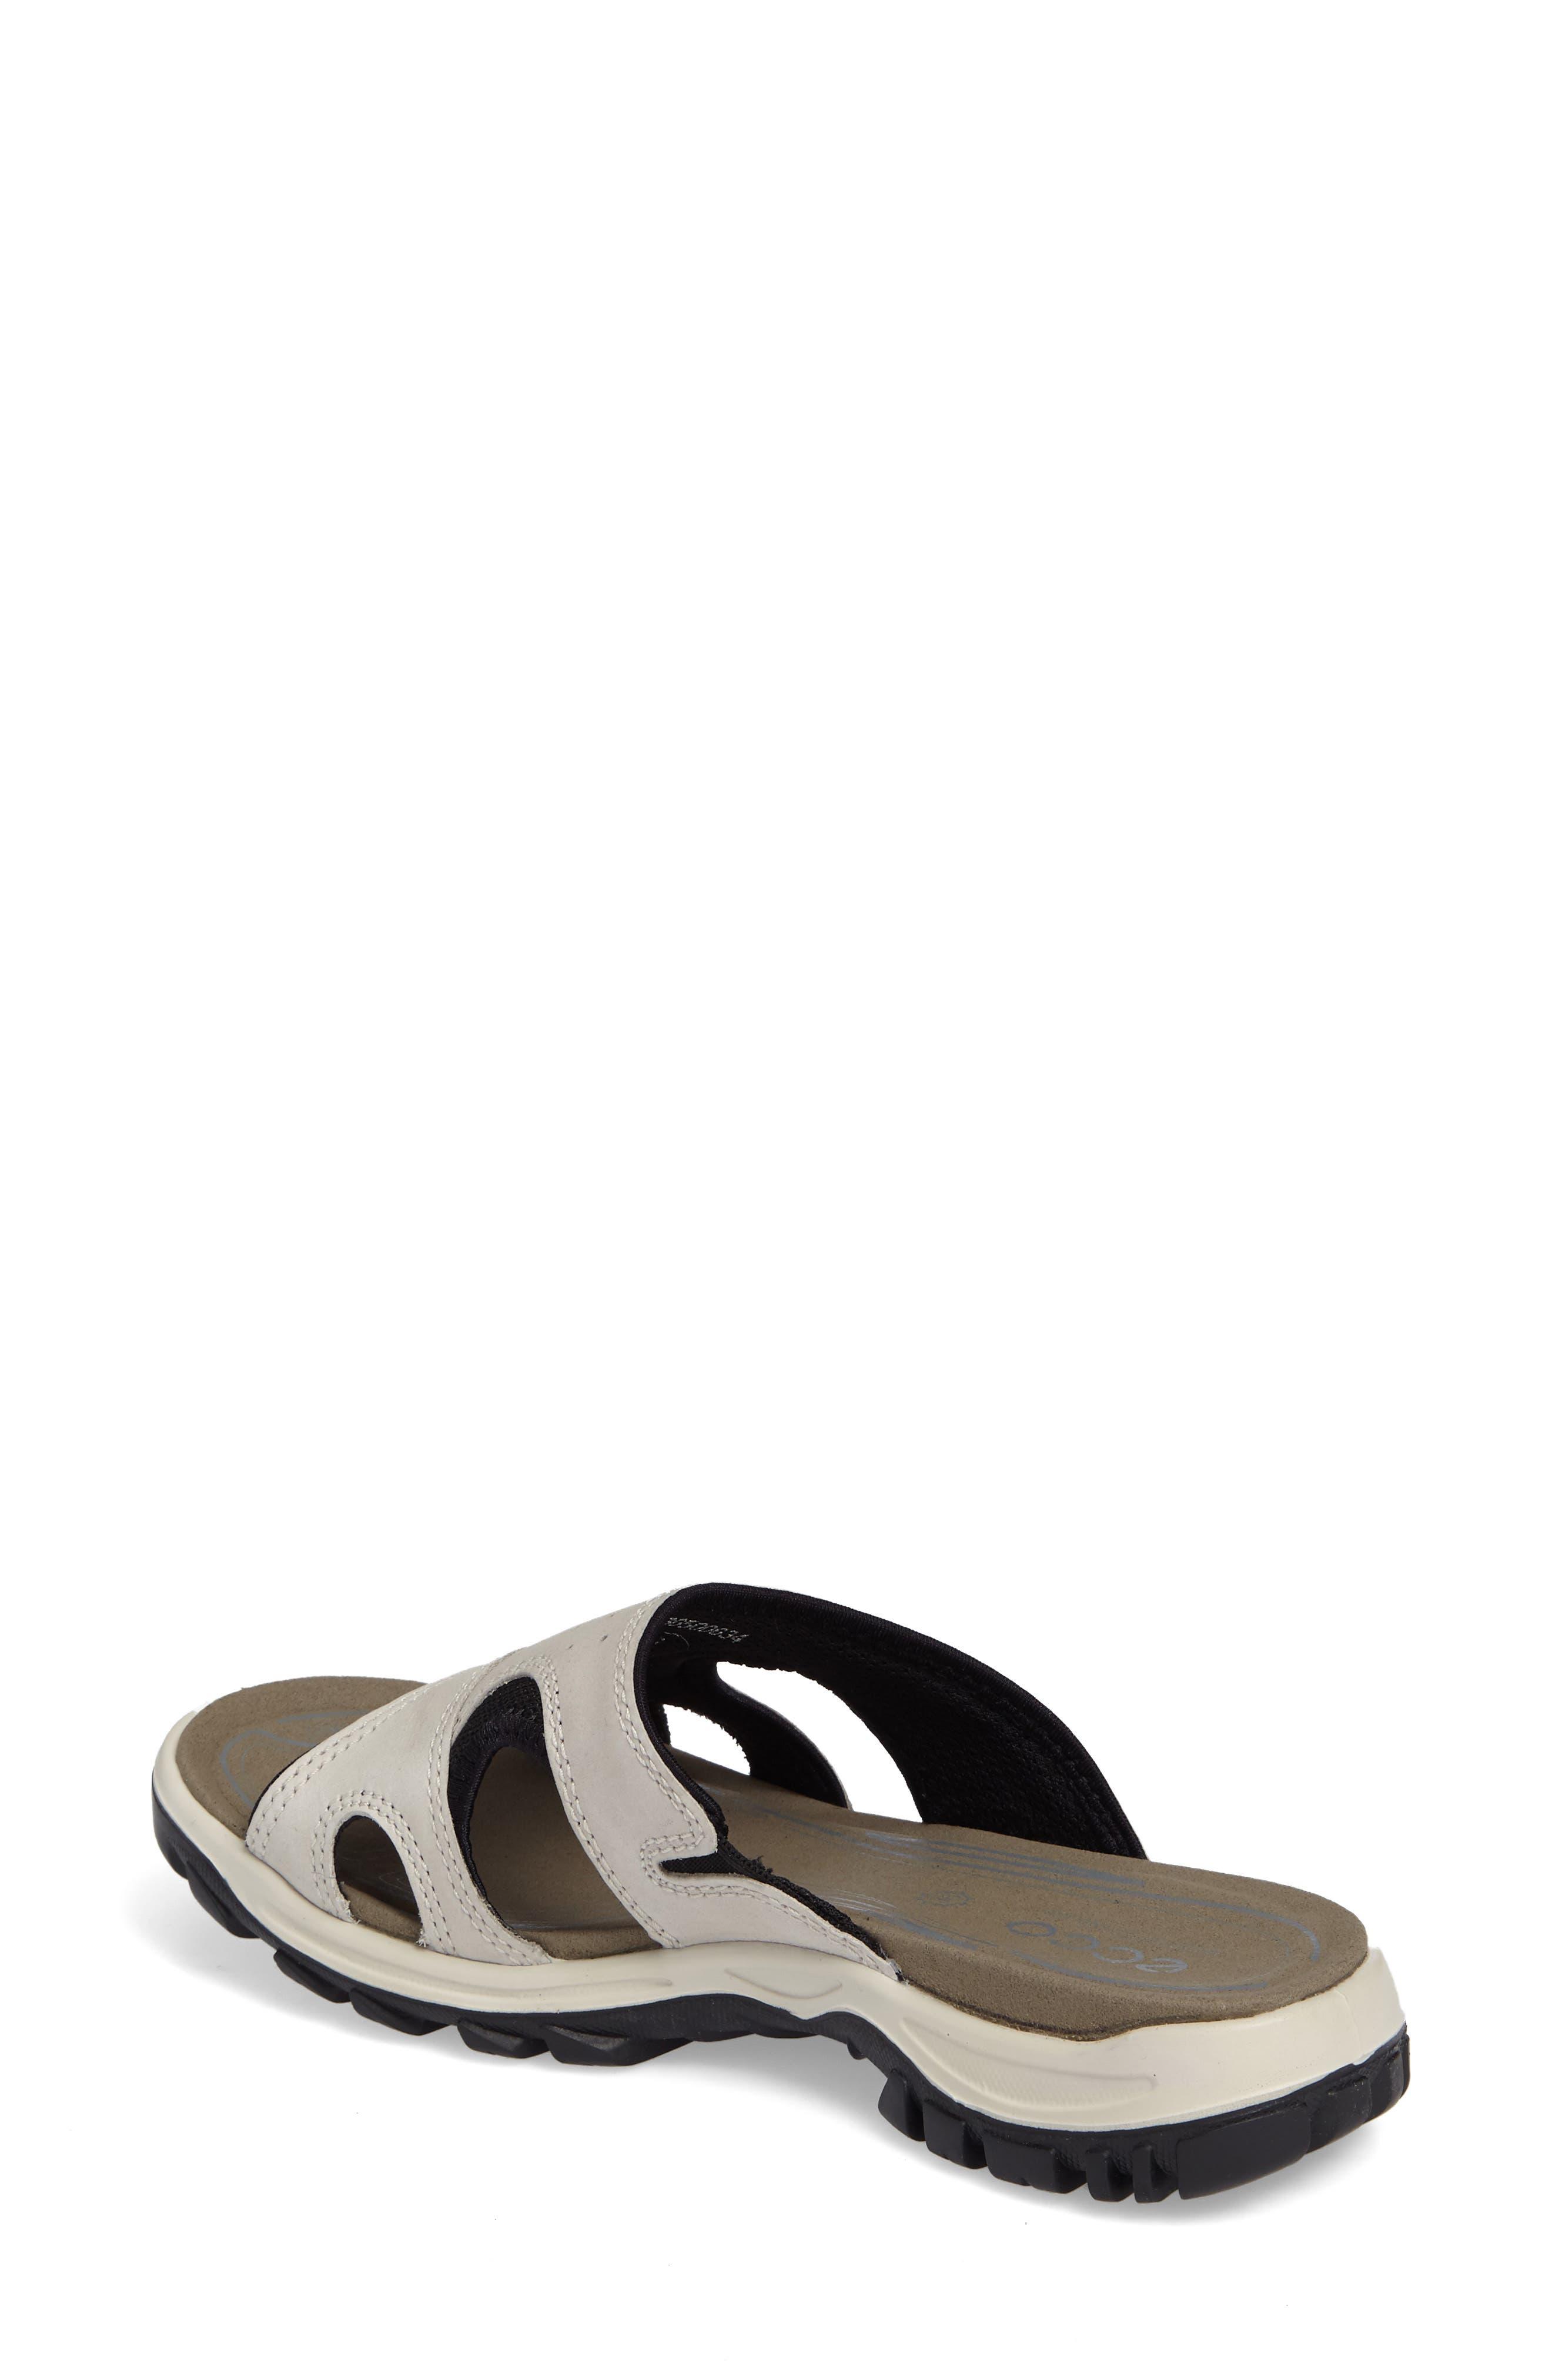 ECCO, Offroad Lite Slide Sandal, Alternate thumbnail 2, color, GRAVEL/ BLACK LEATHER